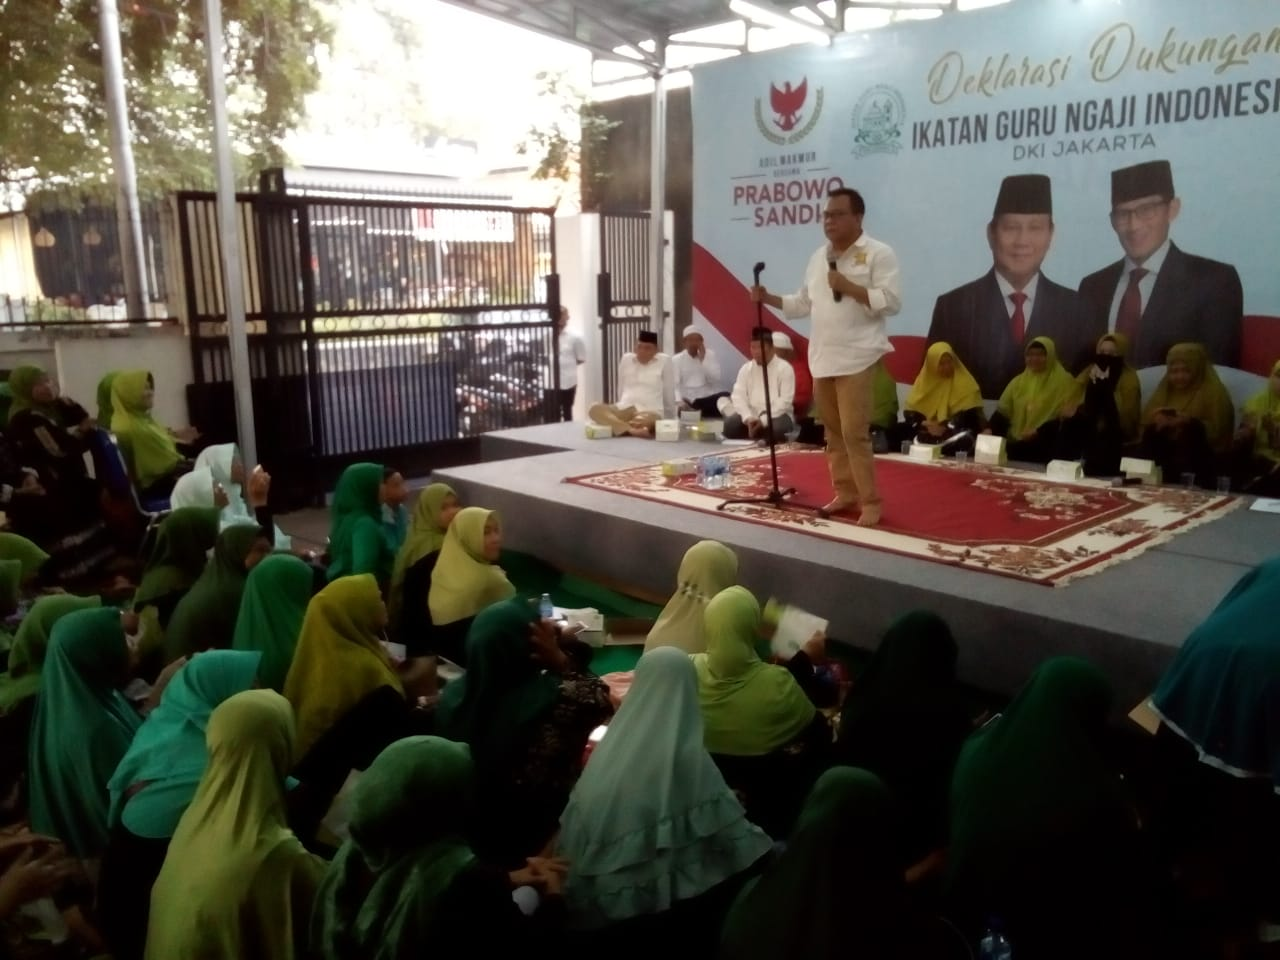 M Topik Ketua Badan Pemenangan DKI Jakarta Prabowo-Sandi